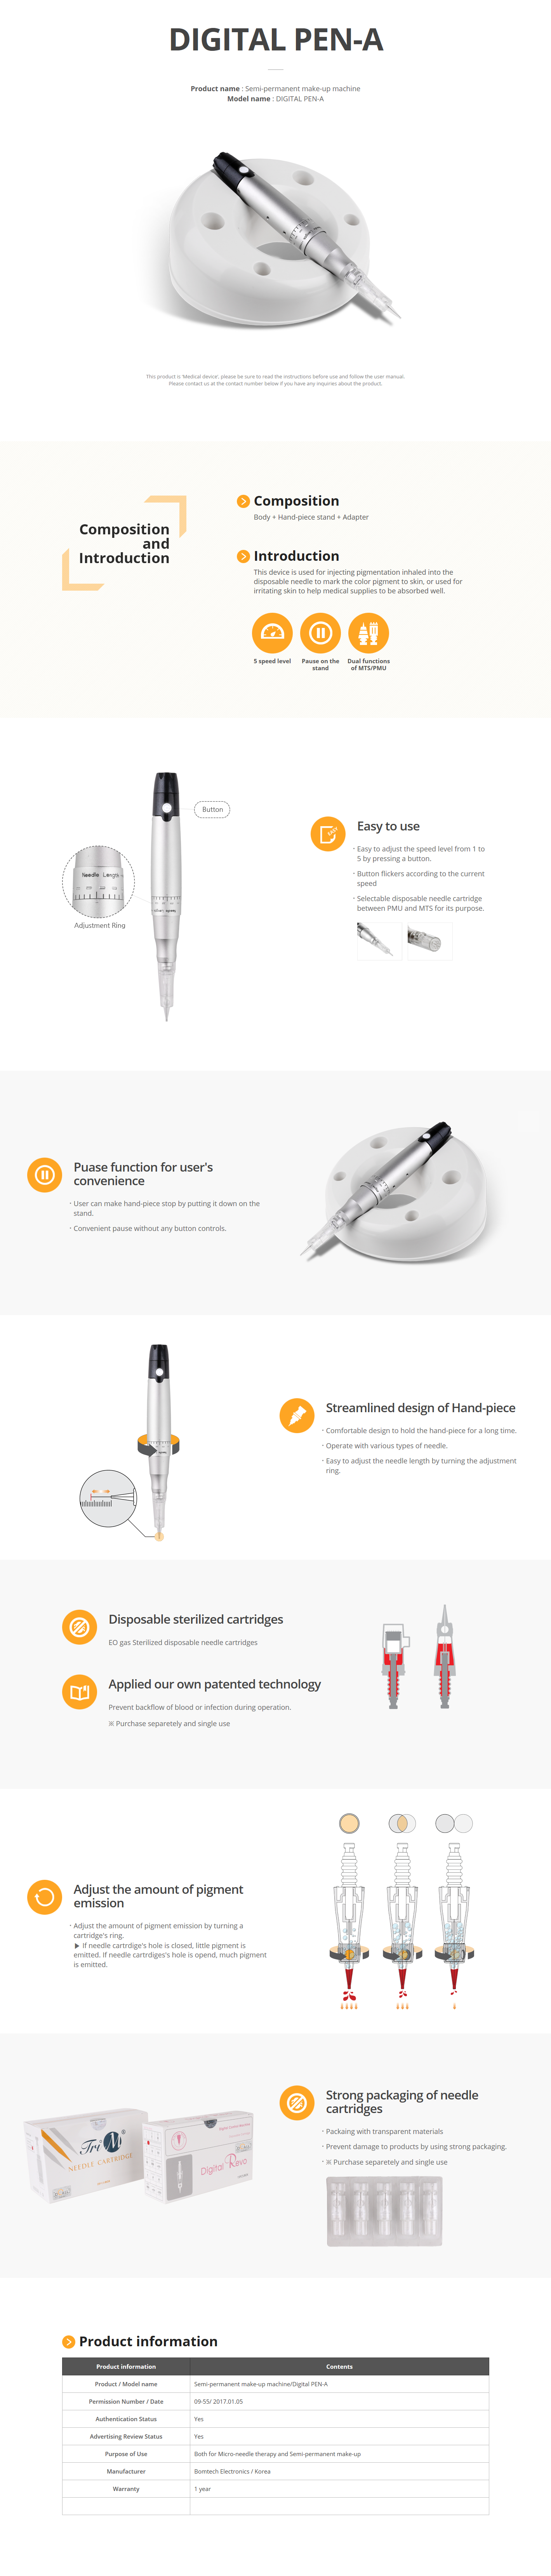 Bomtech Semi-permanent make-up machine DIGITAL PEN-A